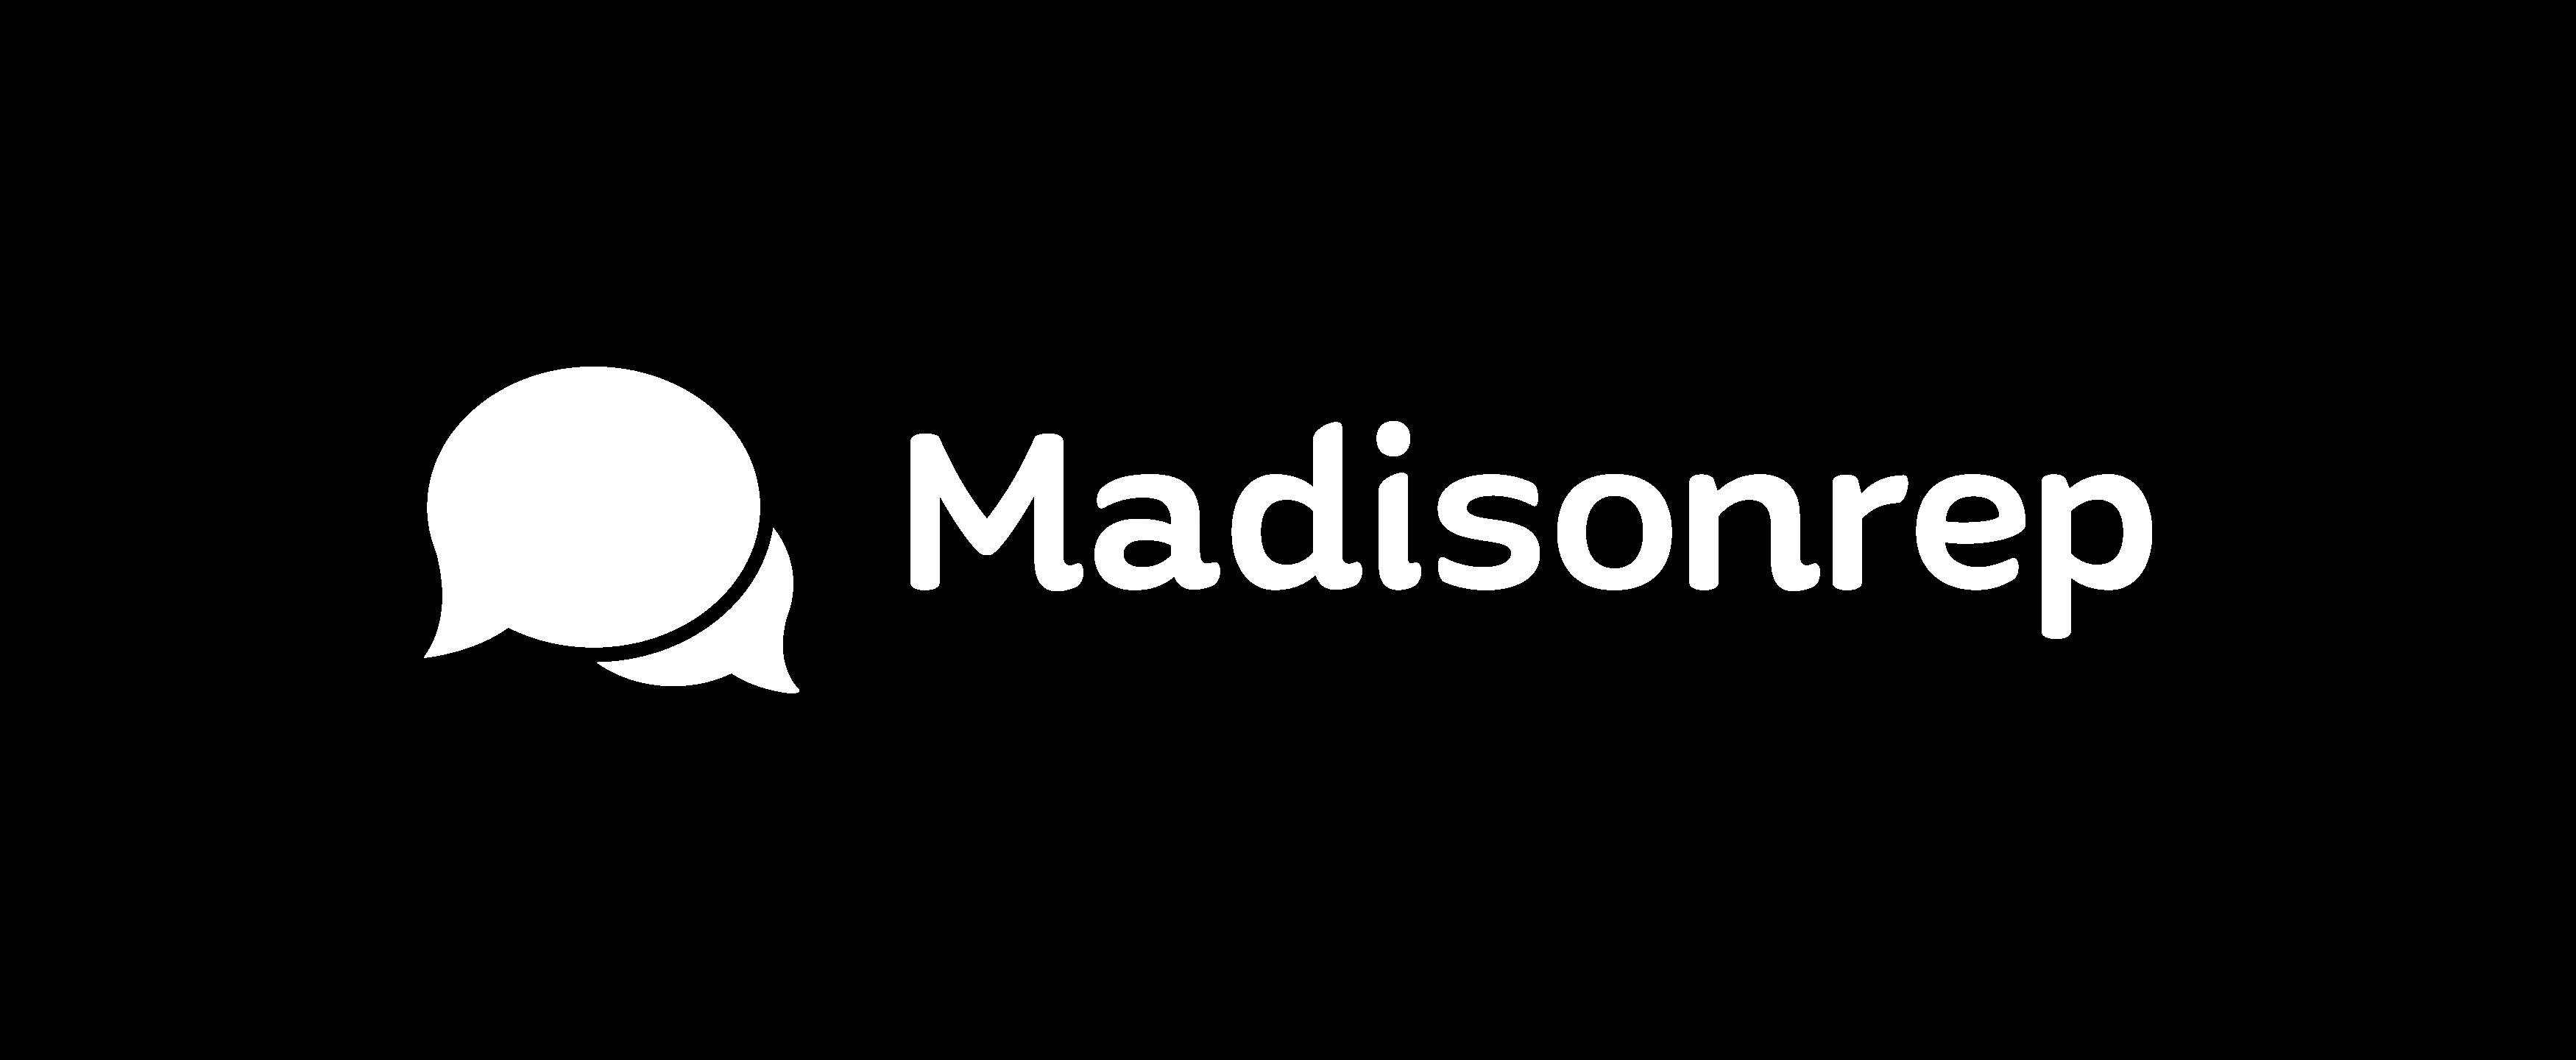 Madisonrep